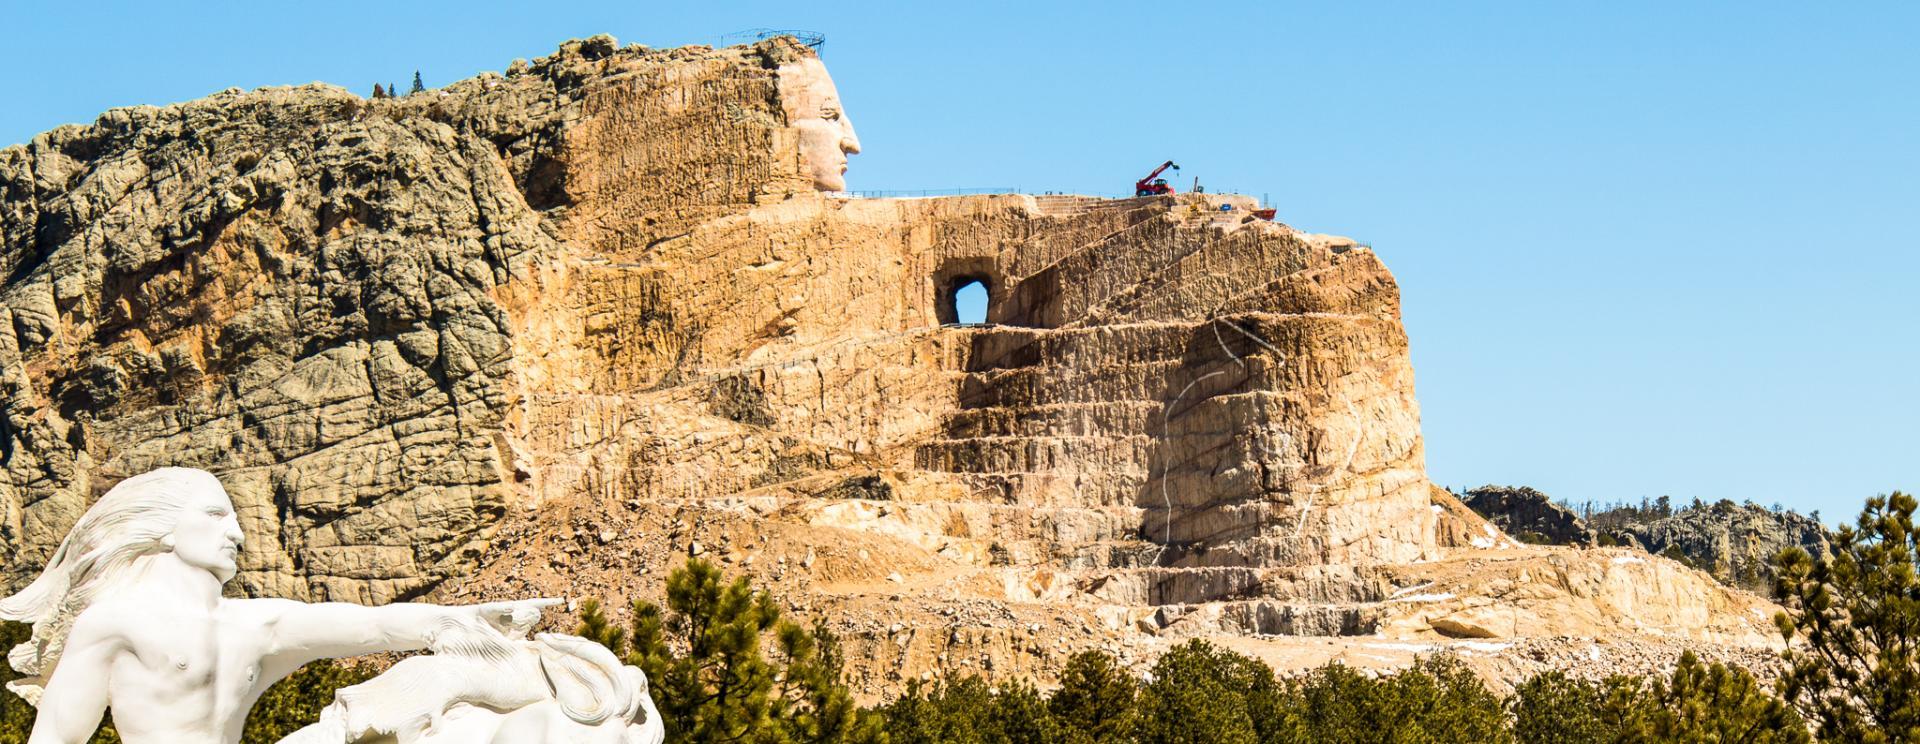 Crazy horse memorial black. Mount rushmore clipart landmark america